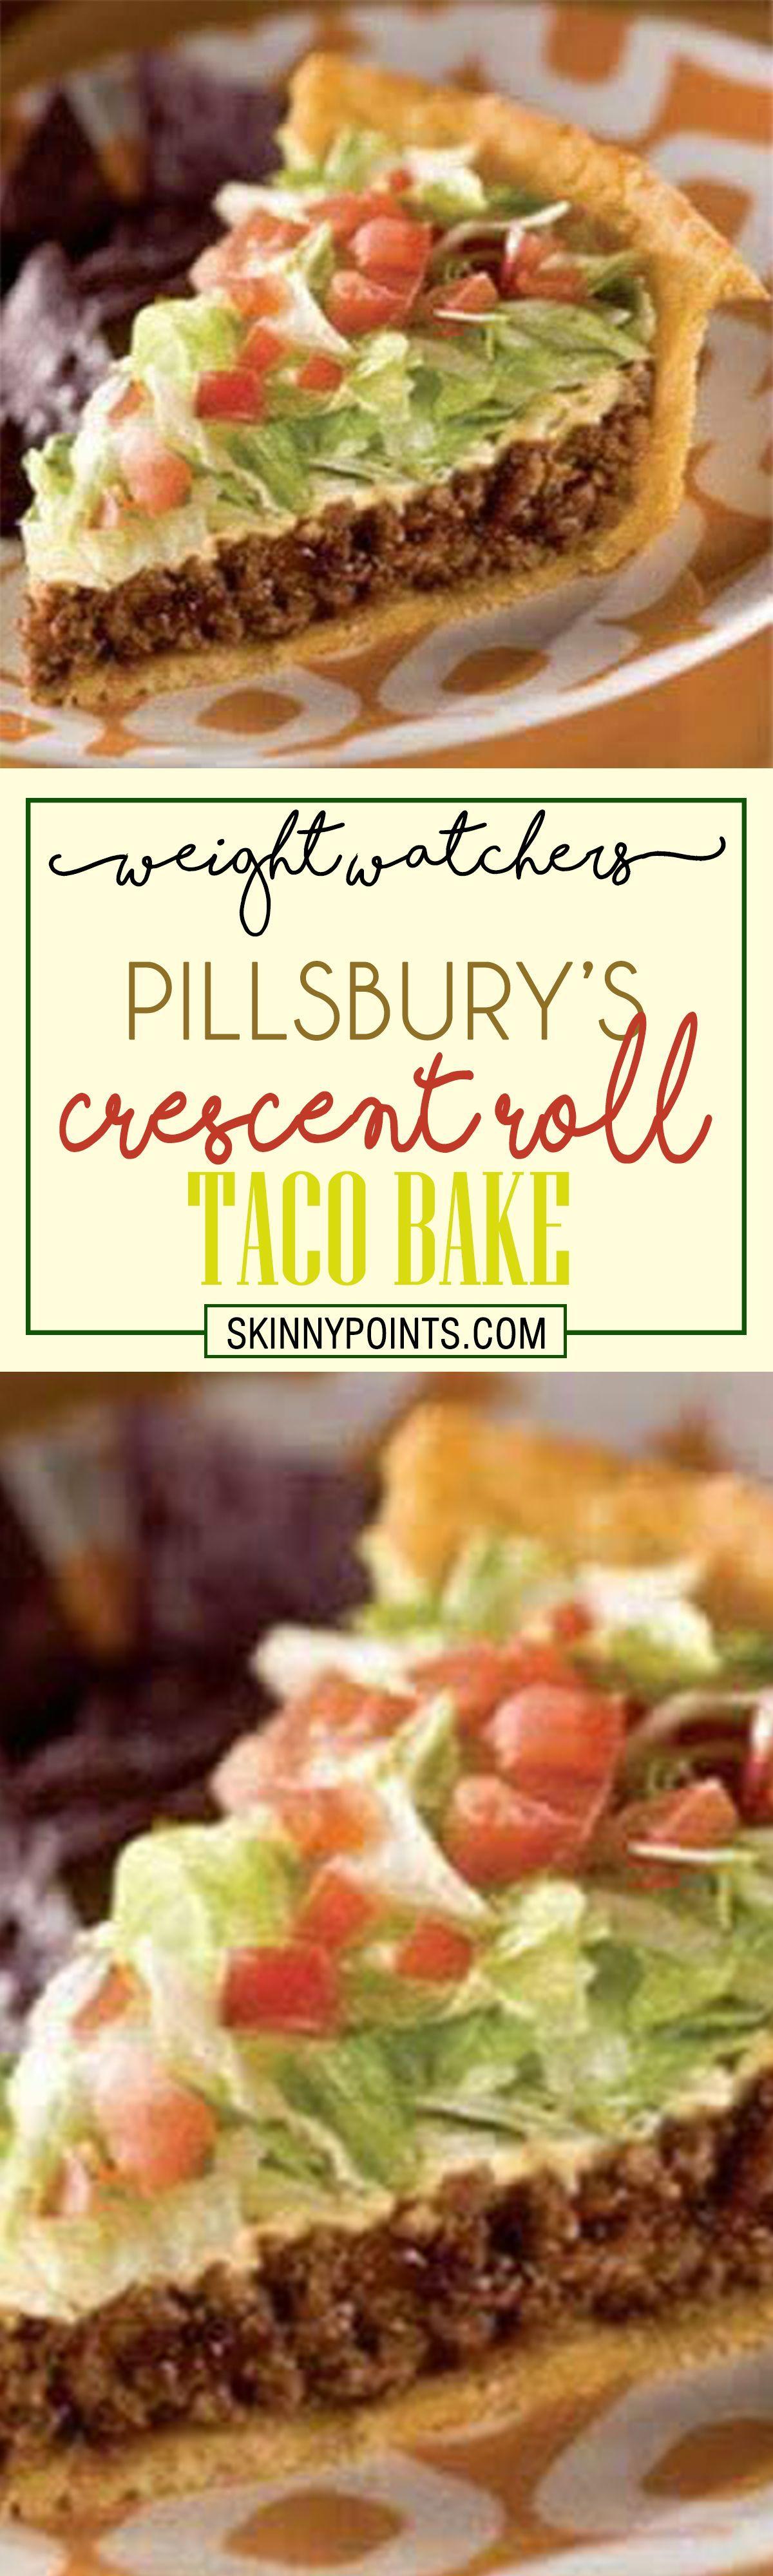 Photo of Pillsbury's Crescent Roll Taco Bake #weightwatchers #weight_watchers #pillsbur…